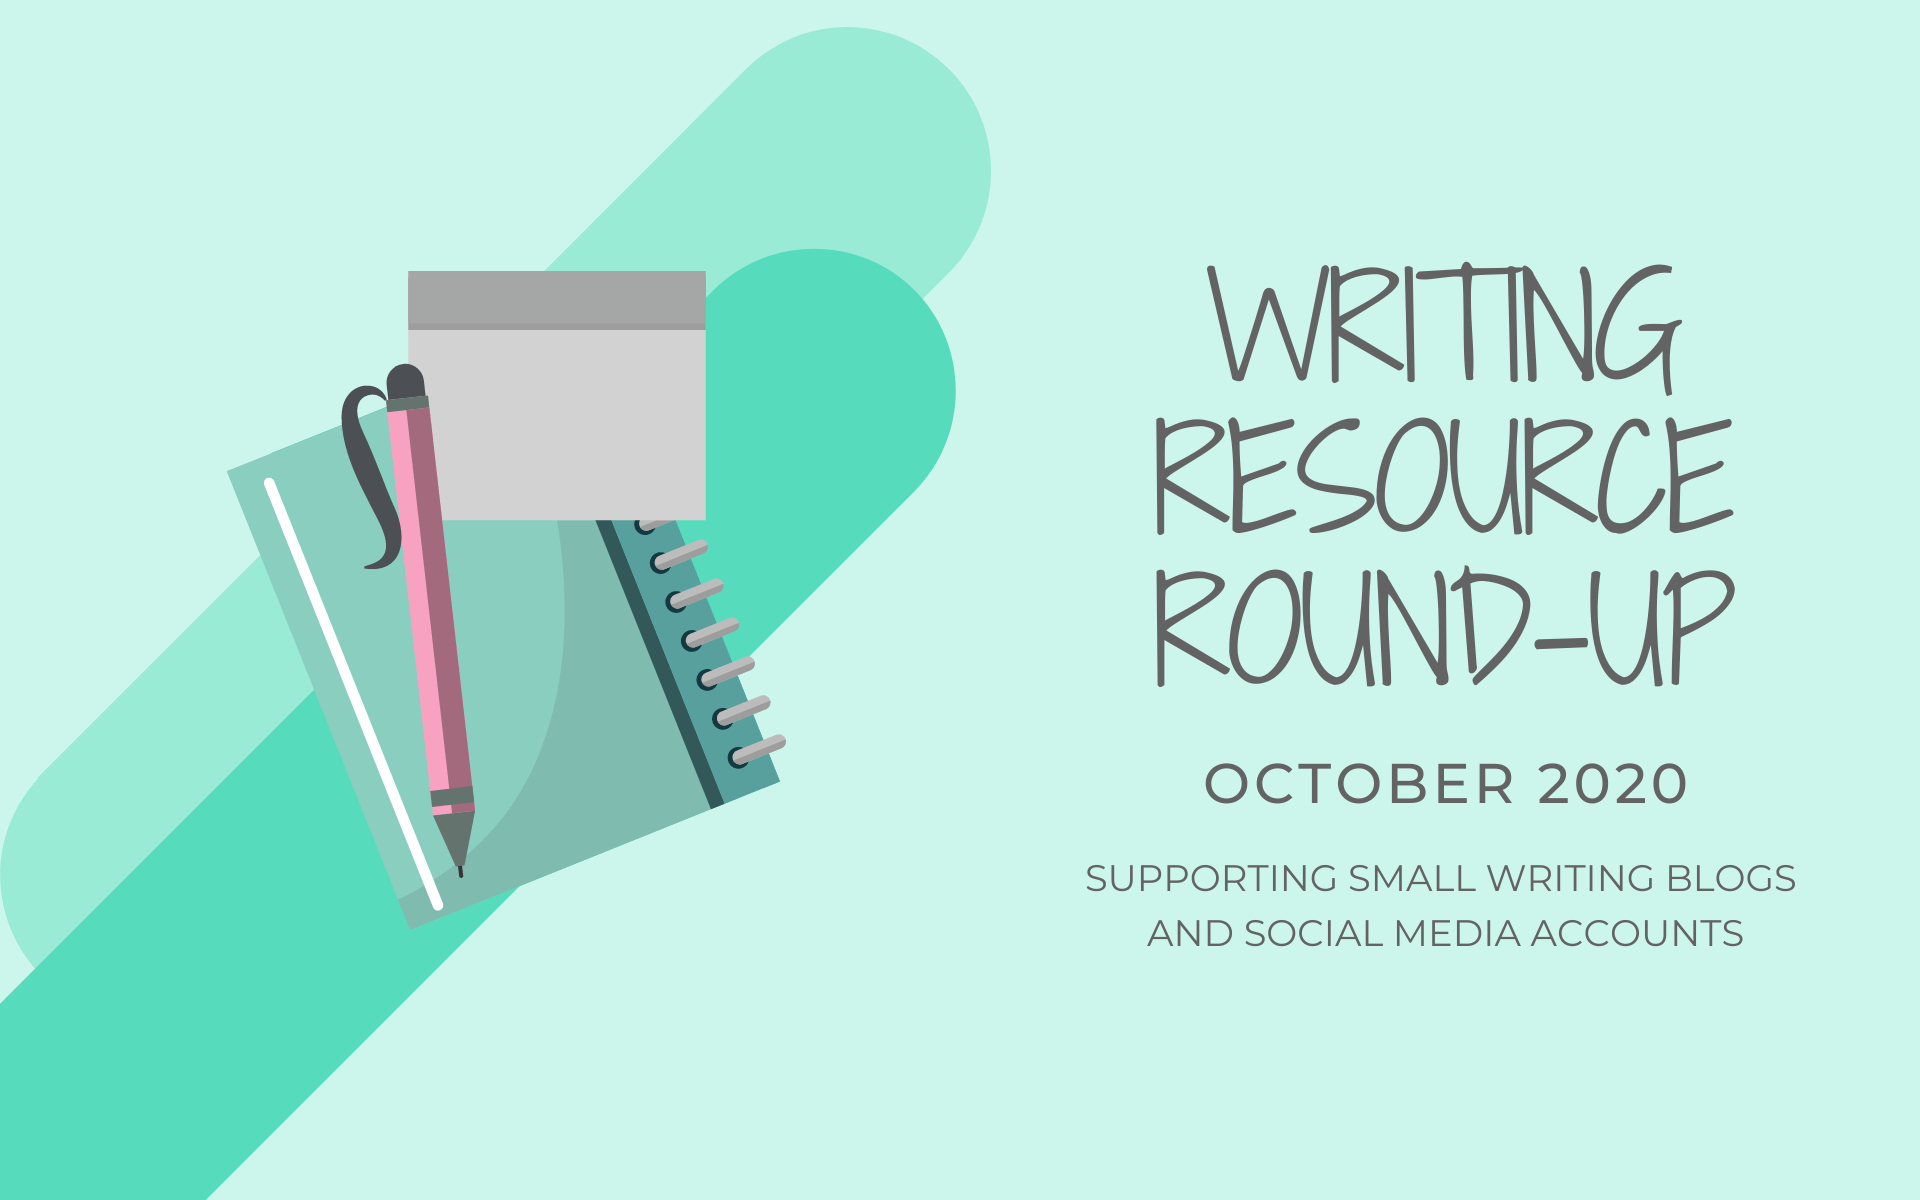 Writing Resource Round-up | October 2020